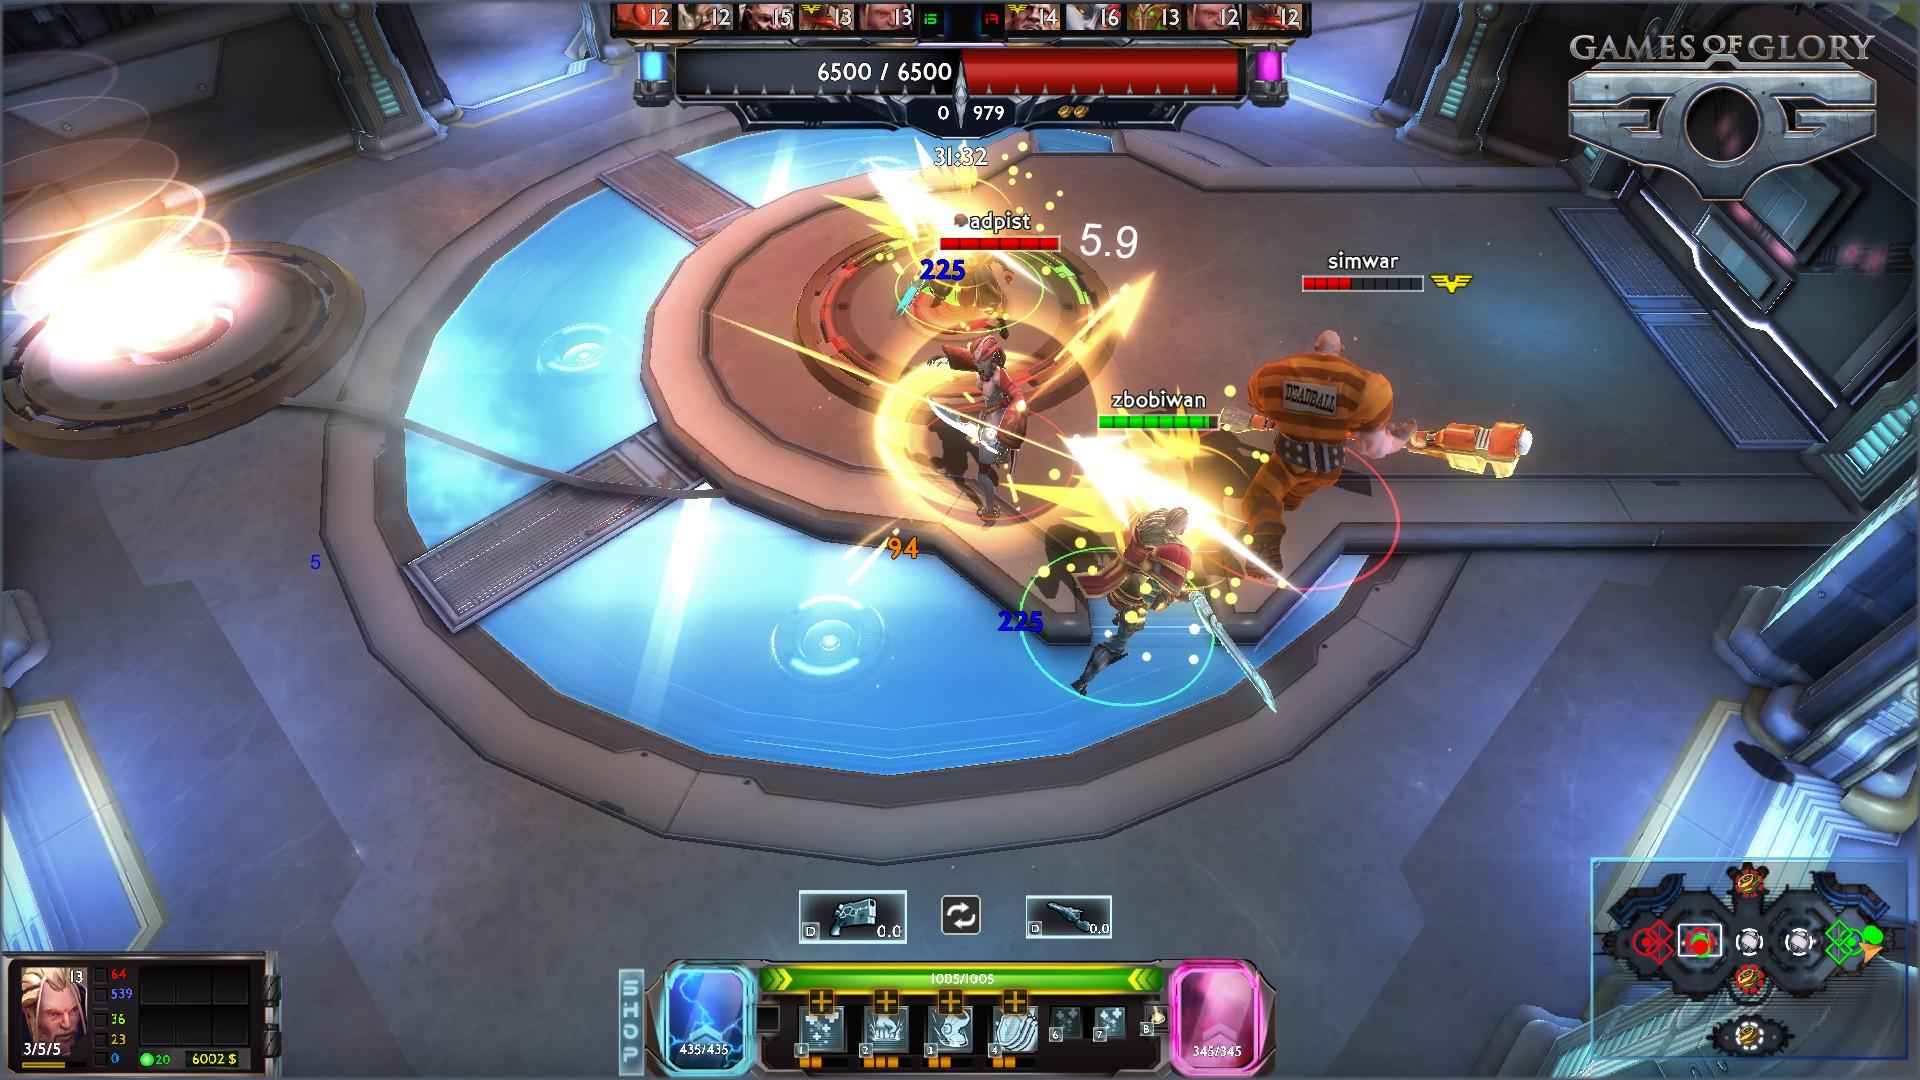 Games-of-Glory-screenshot7